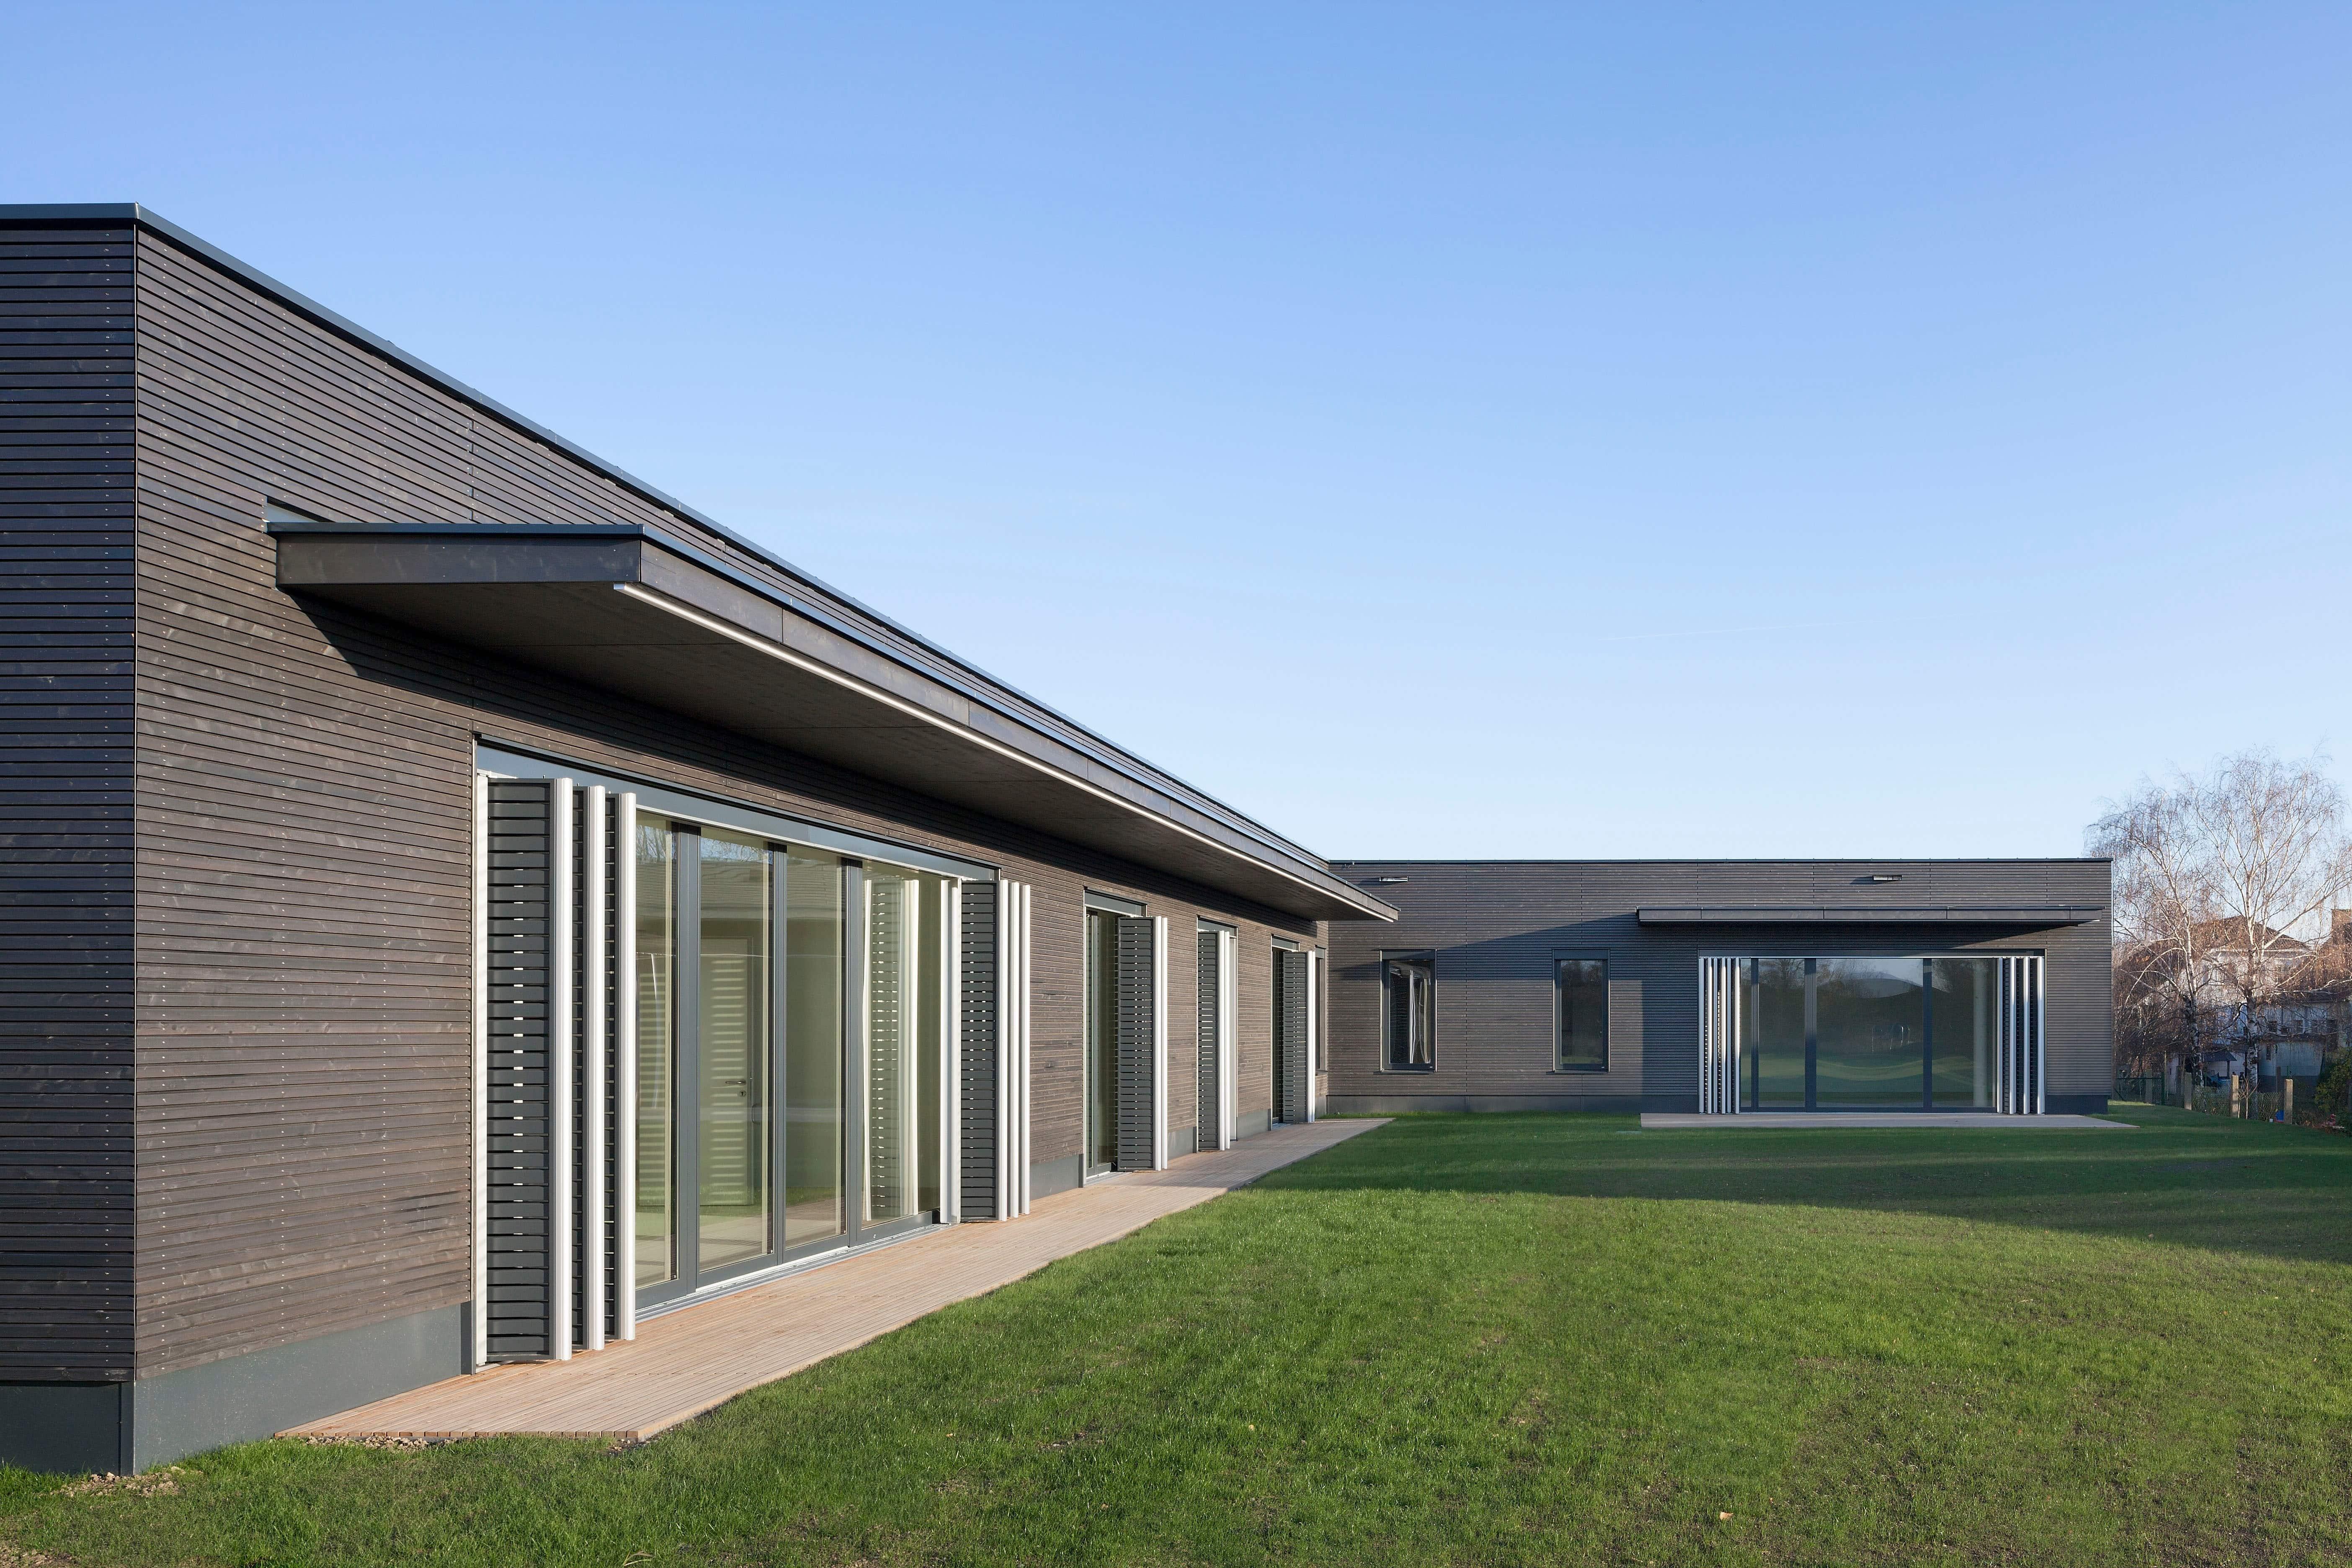 © RUNSER / PRANTL architekten, VKKJ Ambulatorium Mistelbach Neu, 2130 Mistelbach, Österreich, 2017, Ambulatorium, Kinder, Fotograf Rupert Steiner <p>